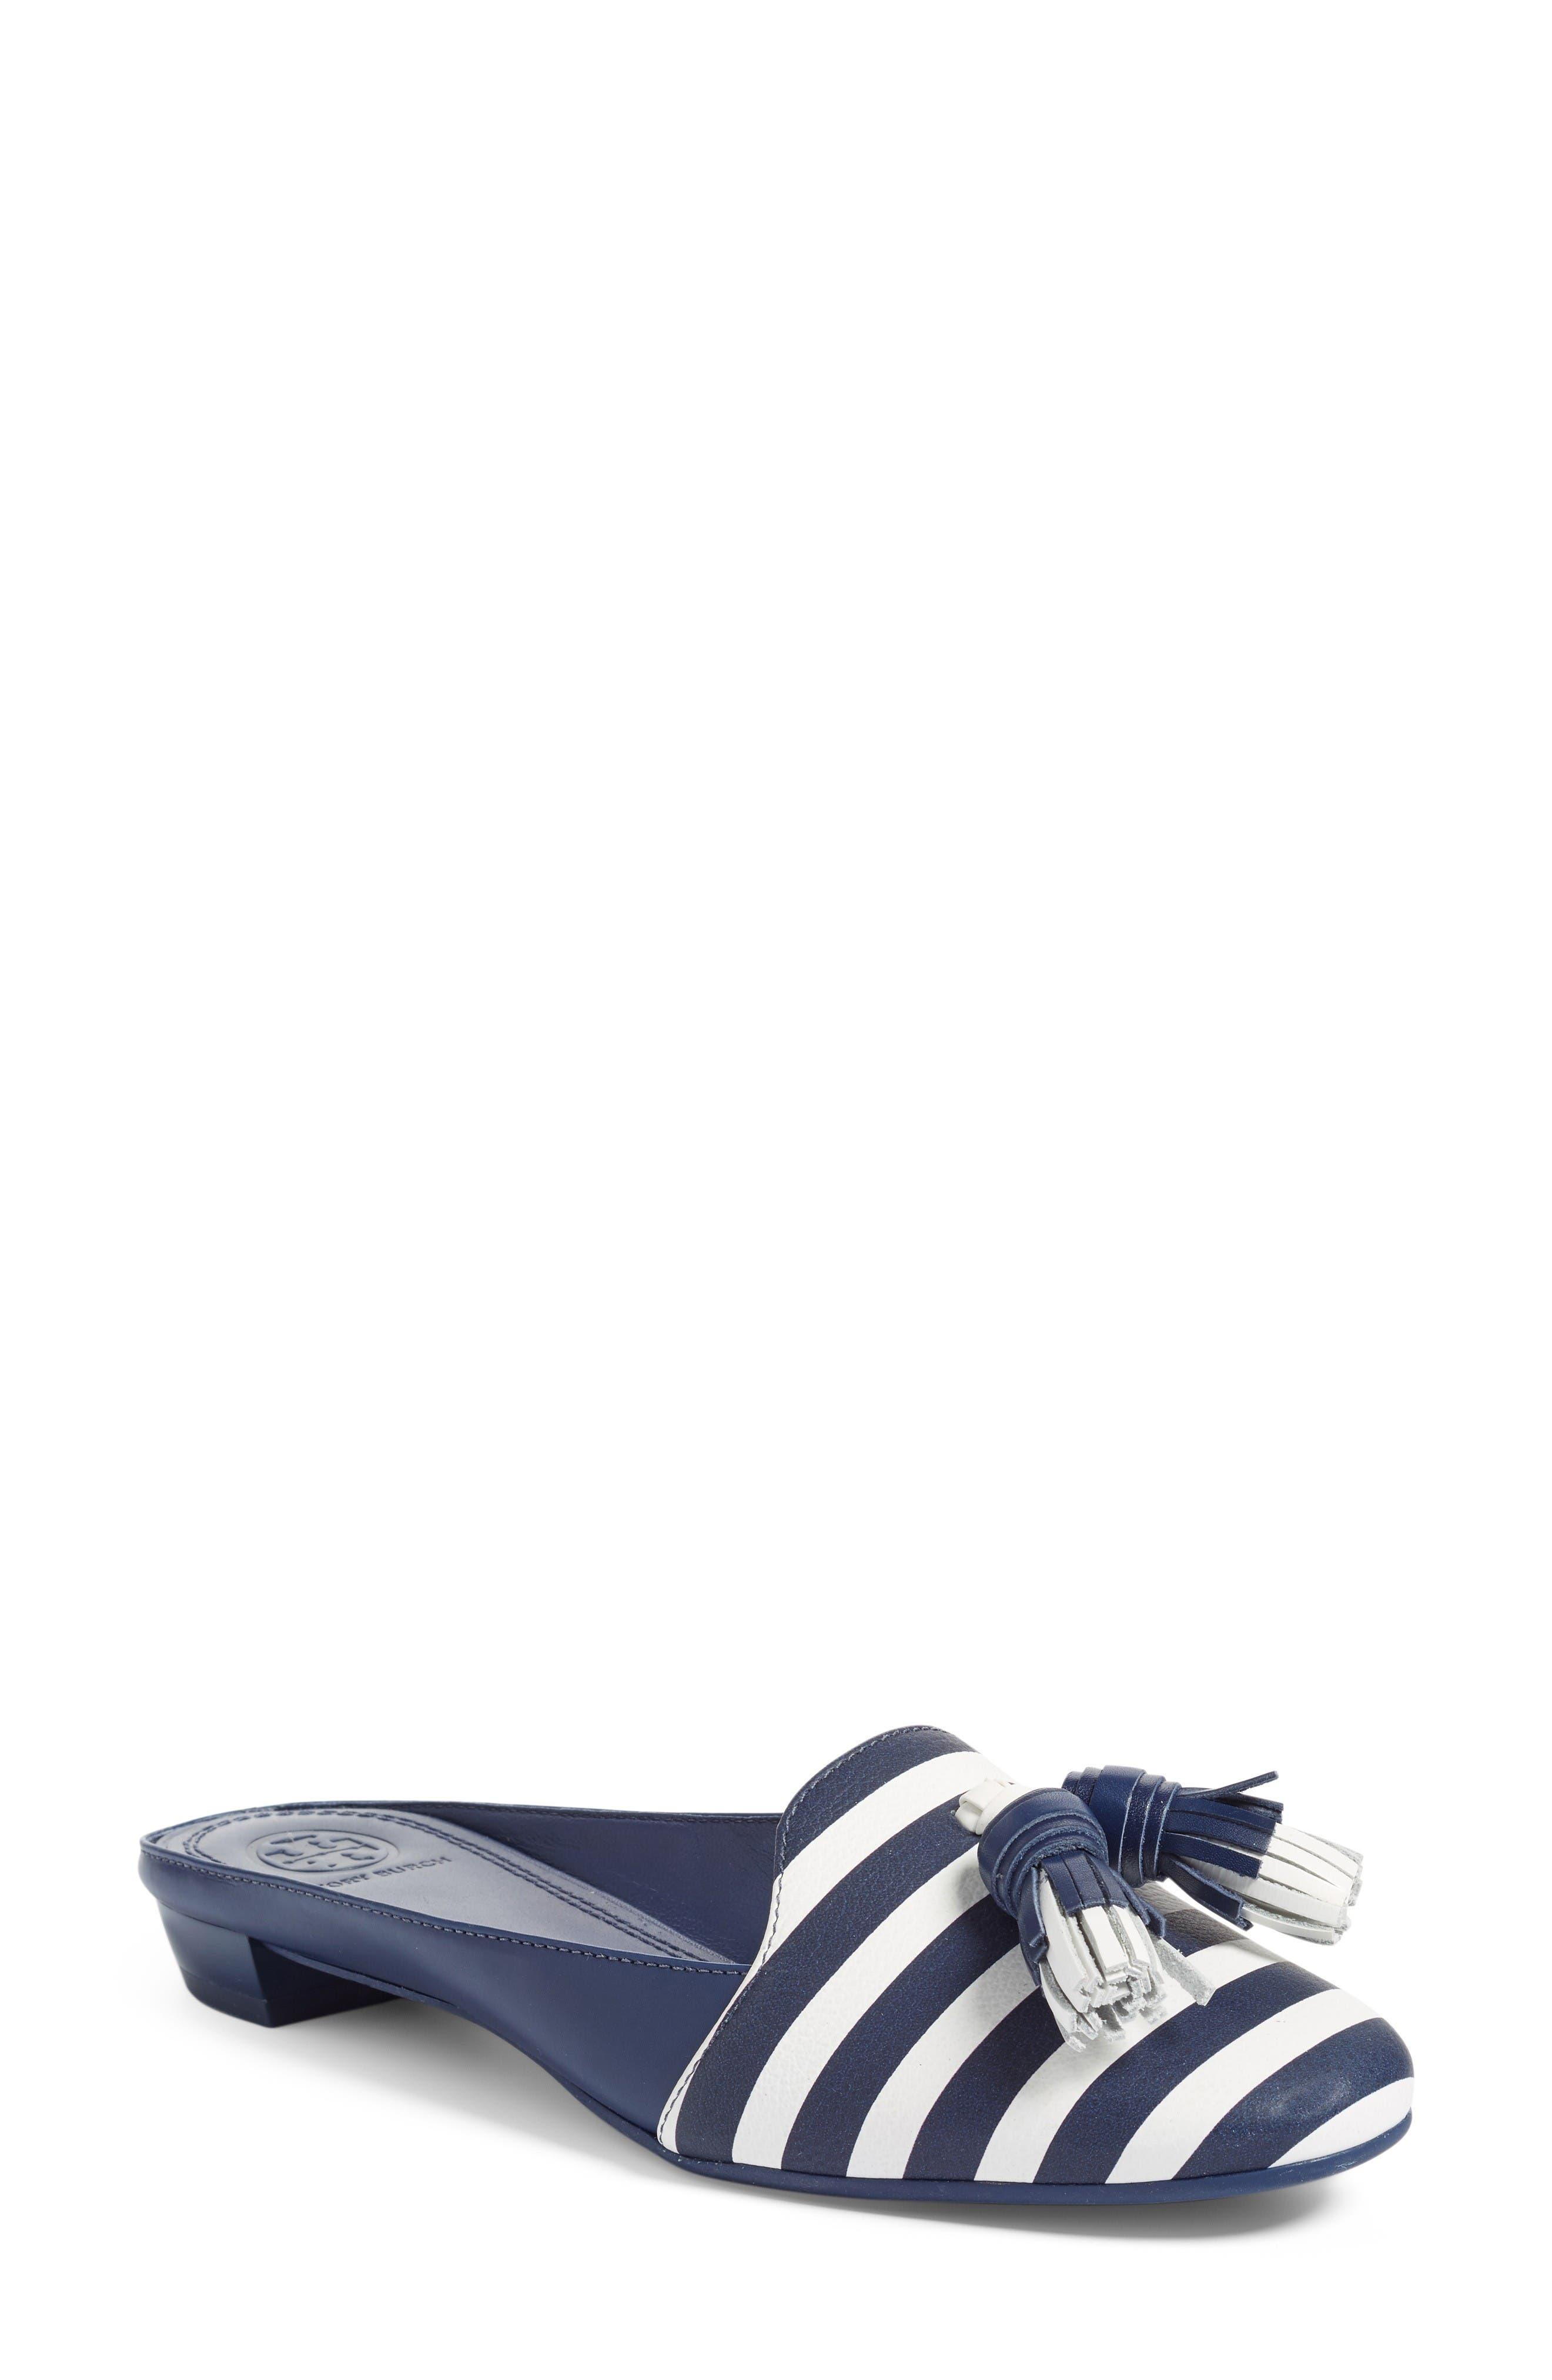 Maritime Tassel Mule Loafer,                         Main,                         color, Navy Sea / White